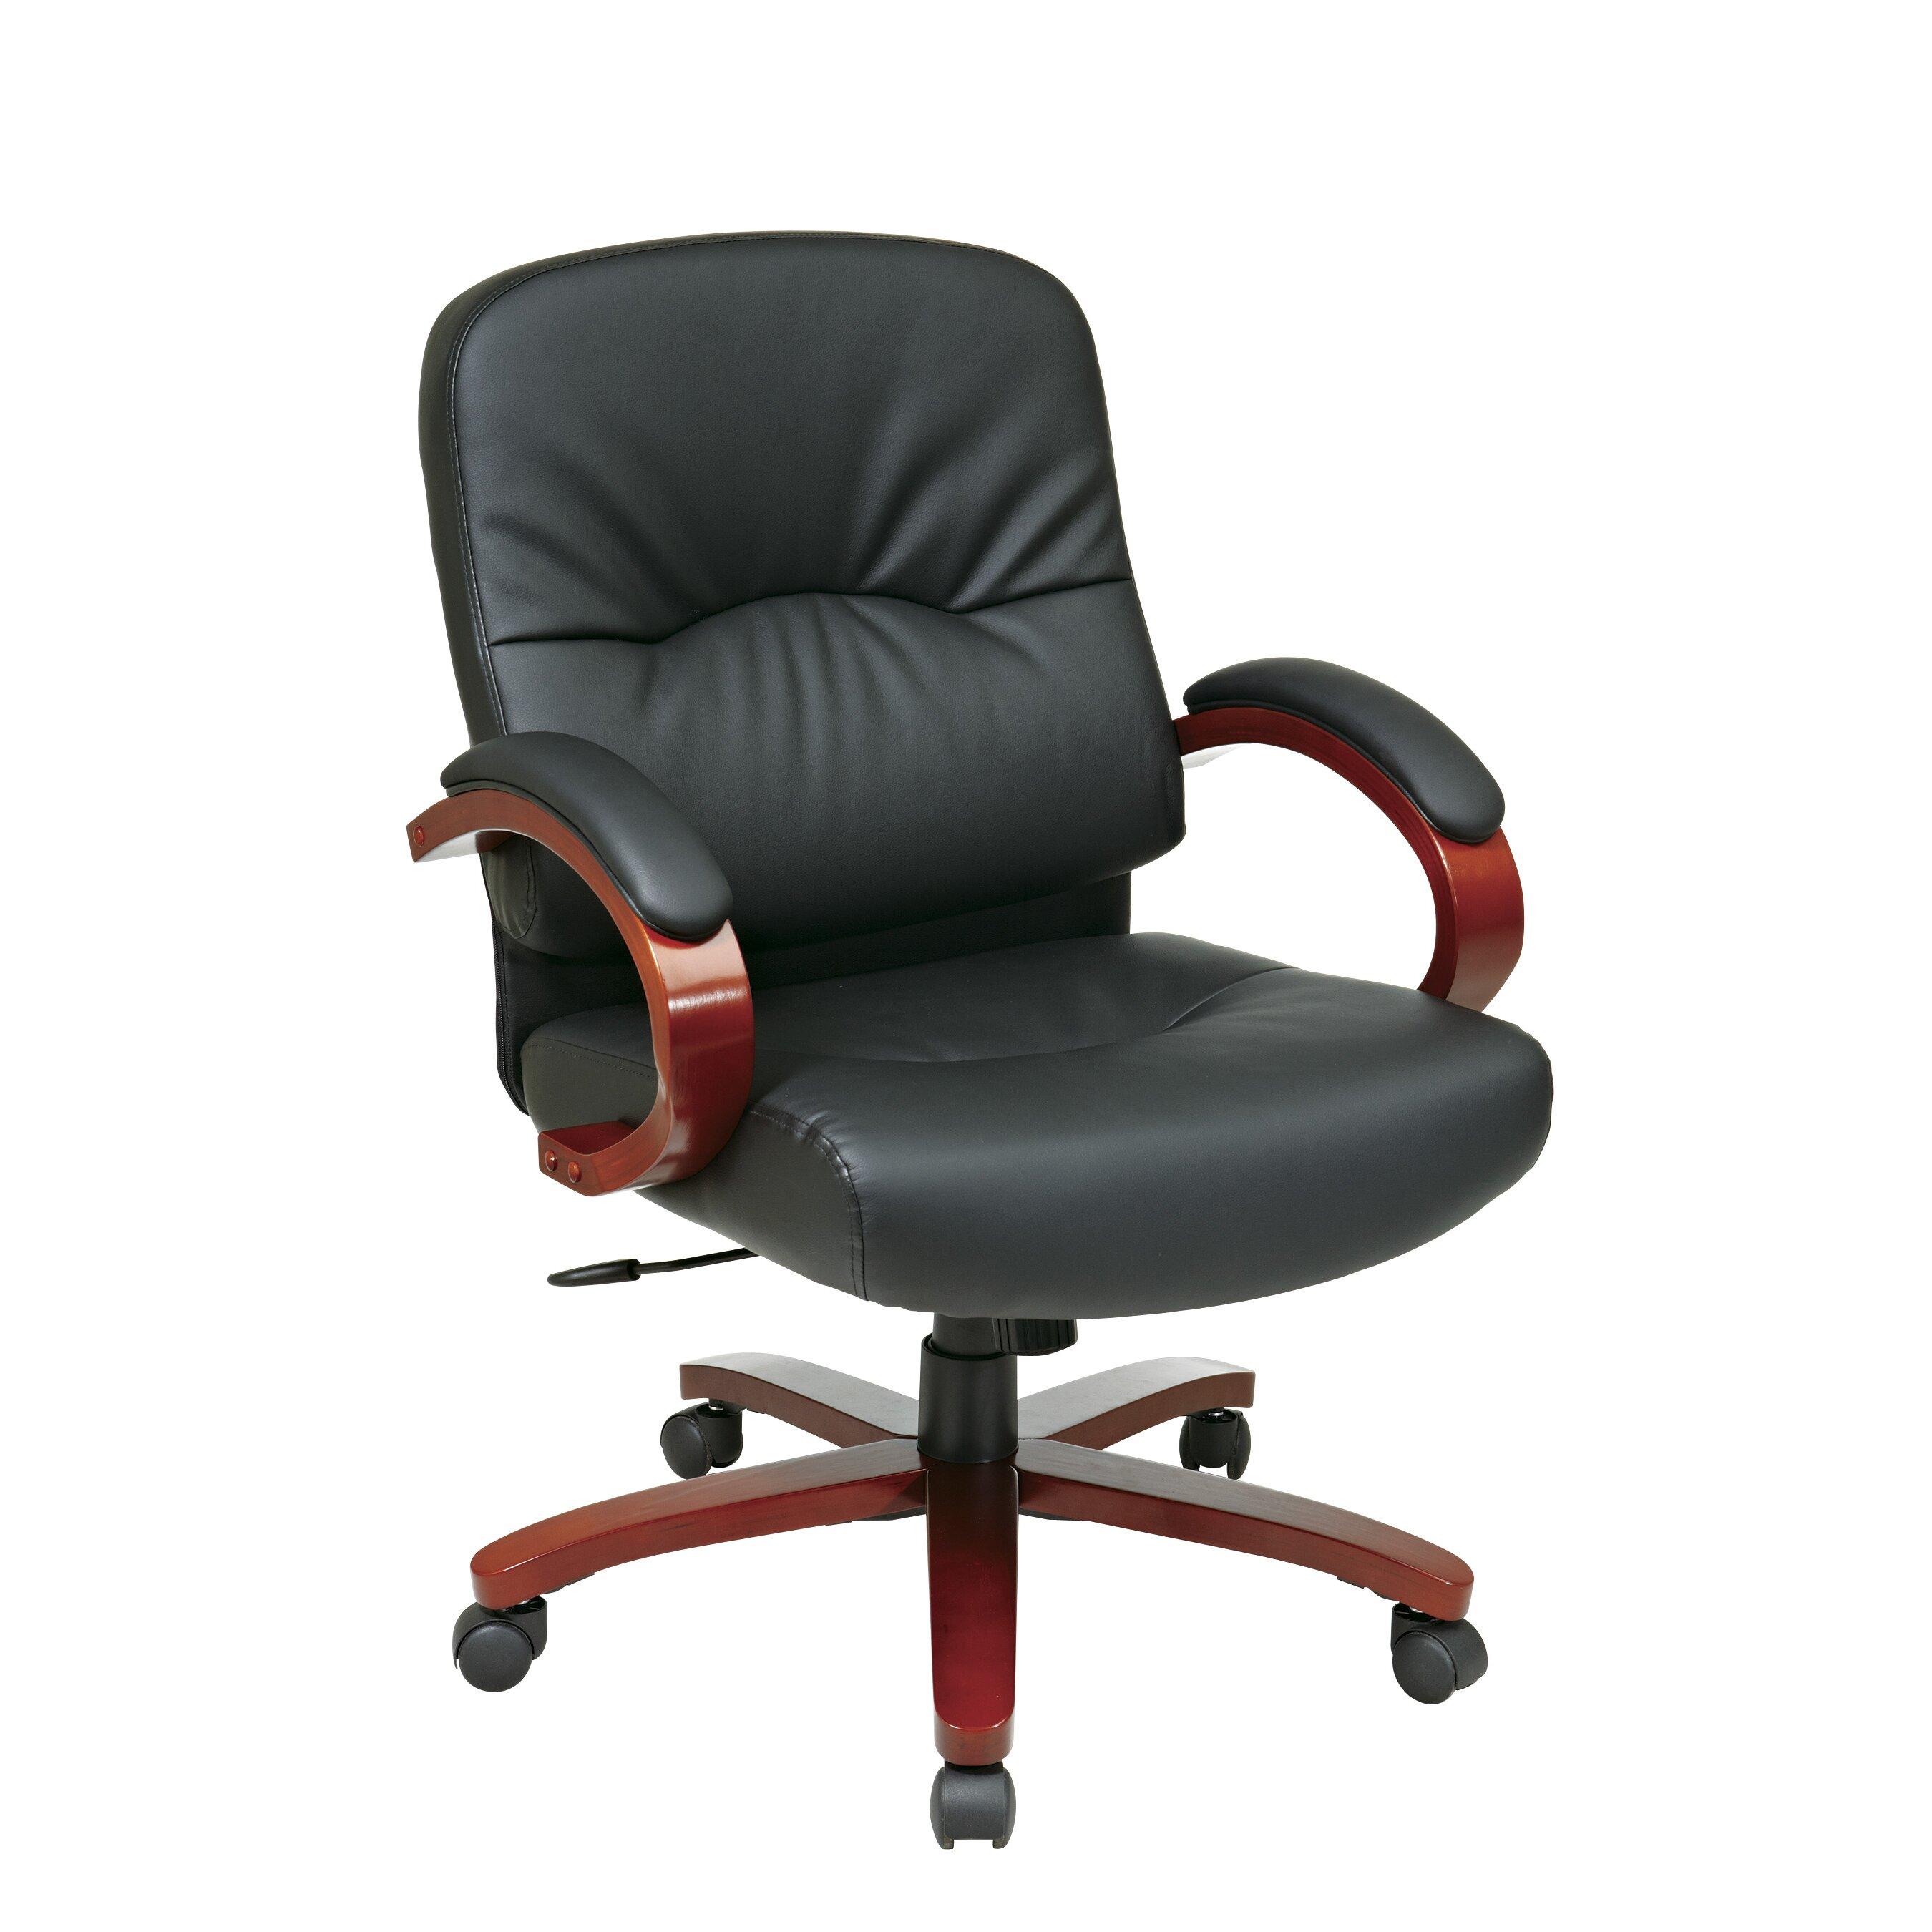 Office Star Mid Back Executive Chair Reviews Wayfair